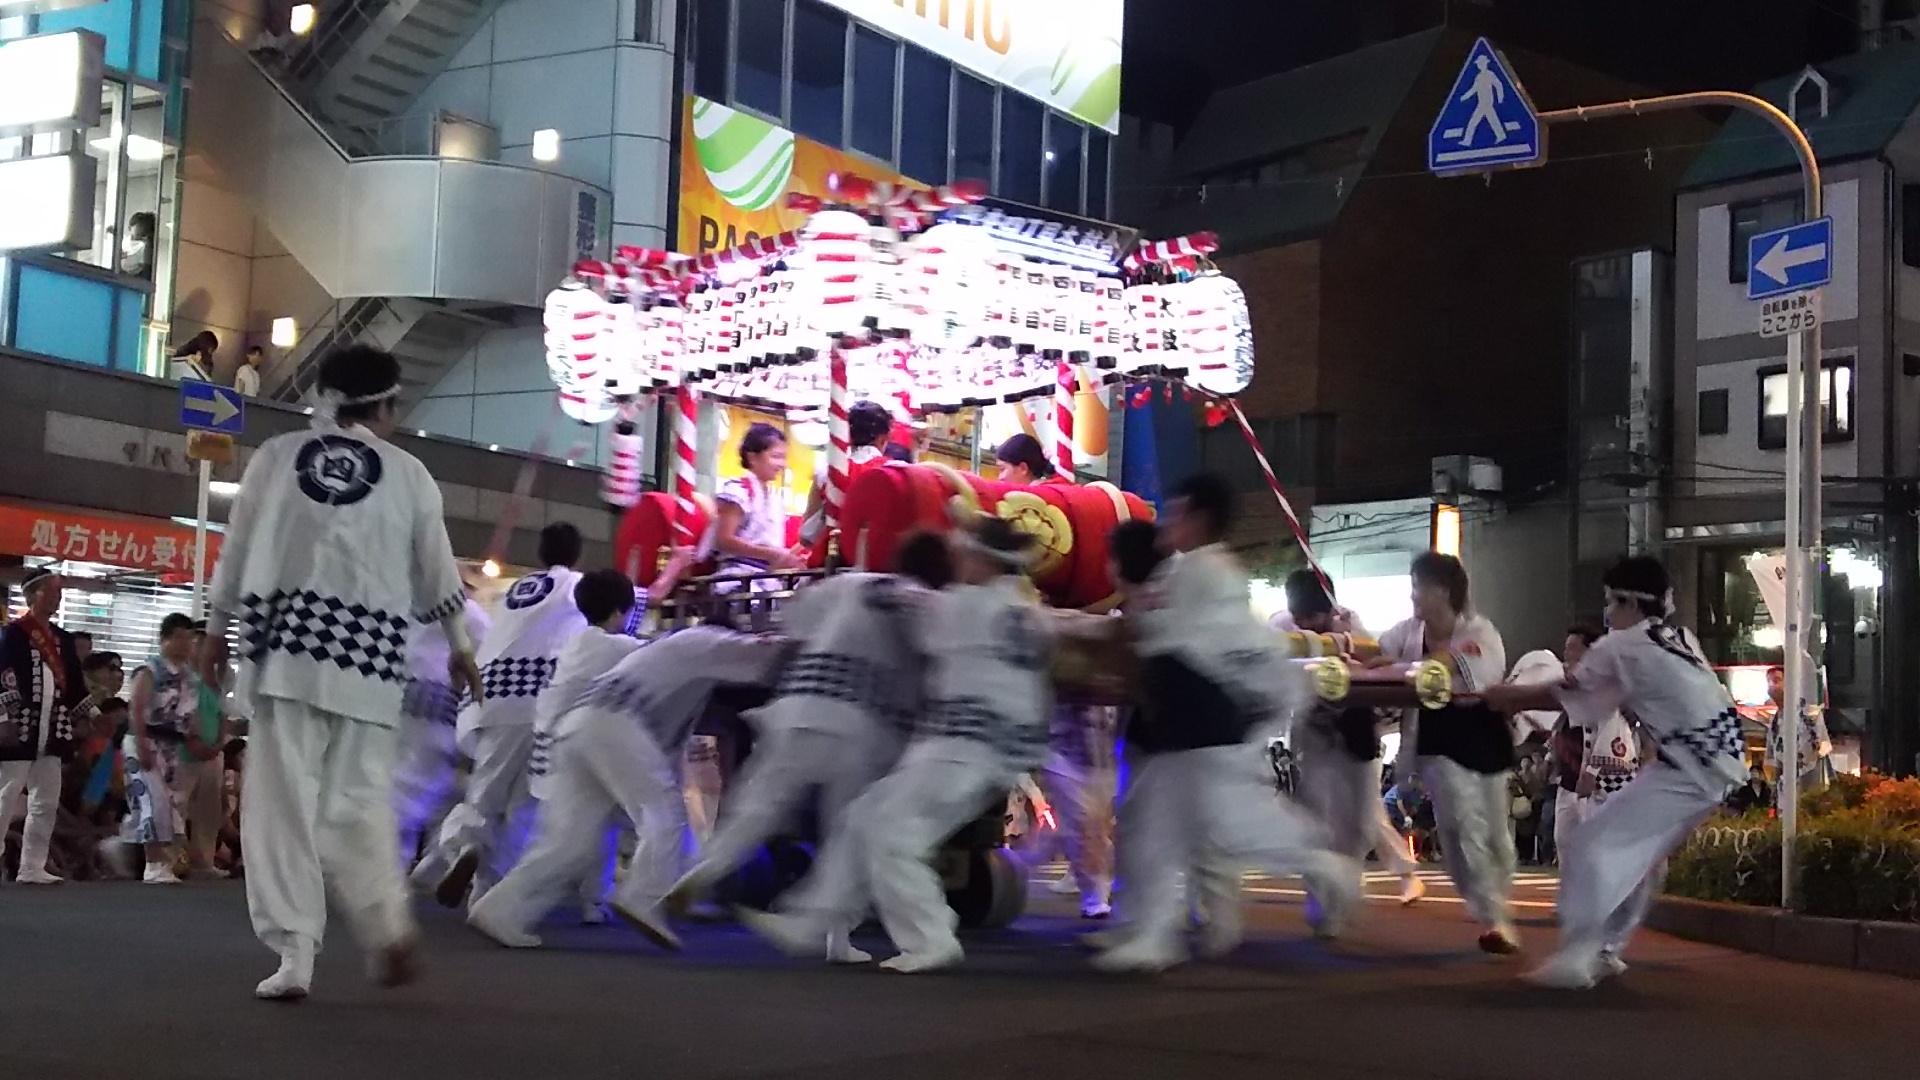 塚本駅前ロータリー 塚本神社 四丁目太鼓